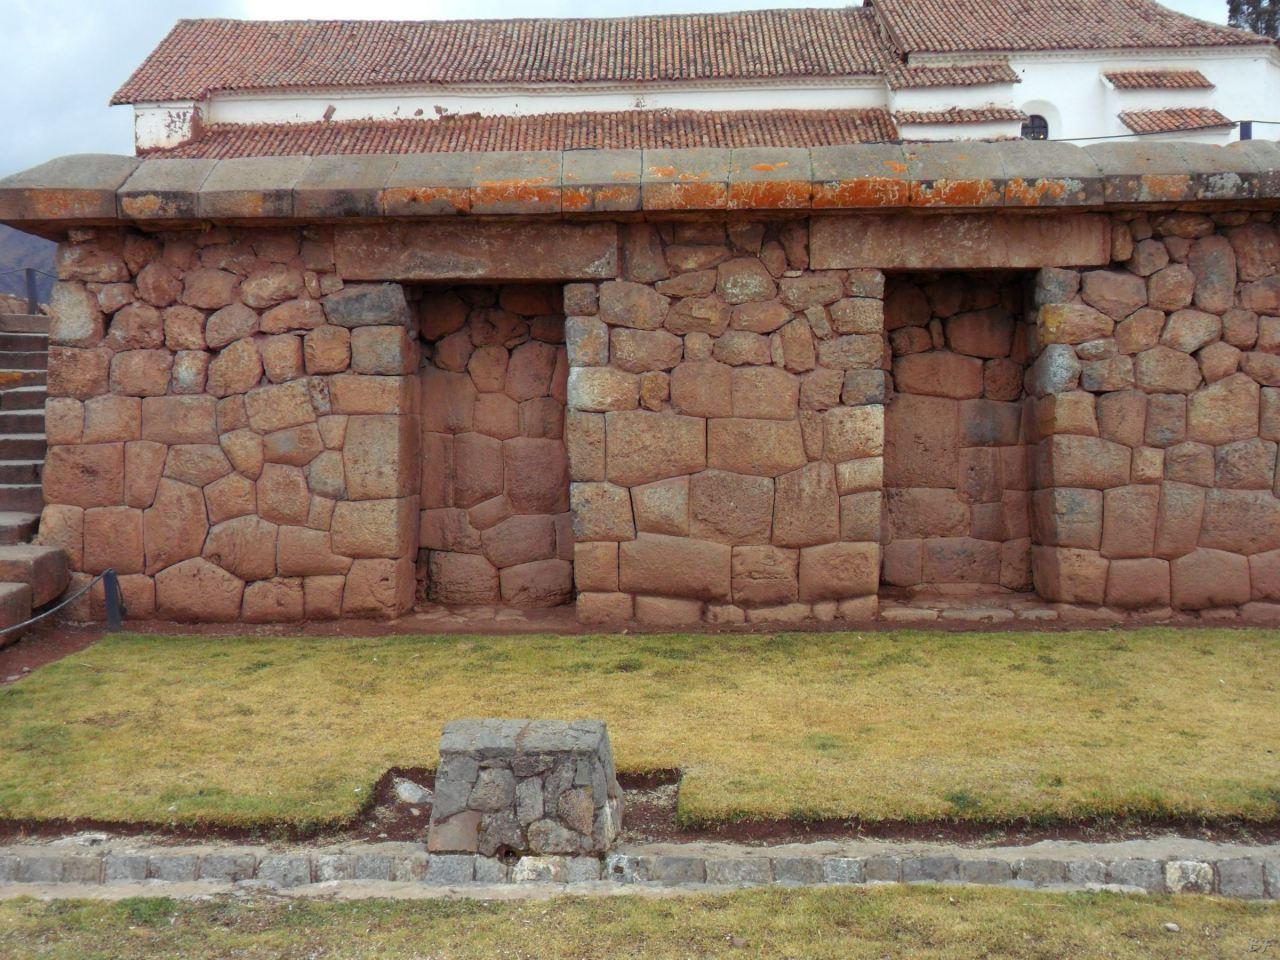 Chinchero-Mura-Poligonali-Piramide-Urubamba-Peru-19